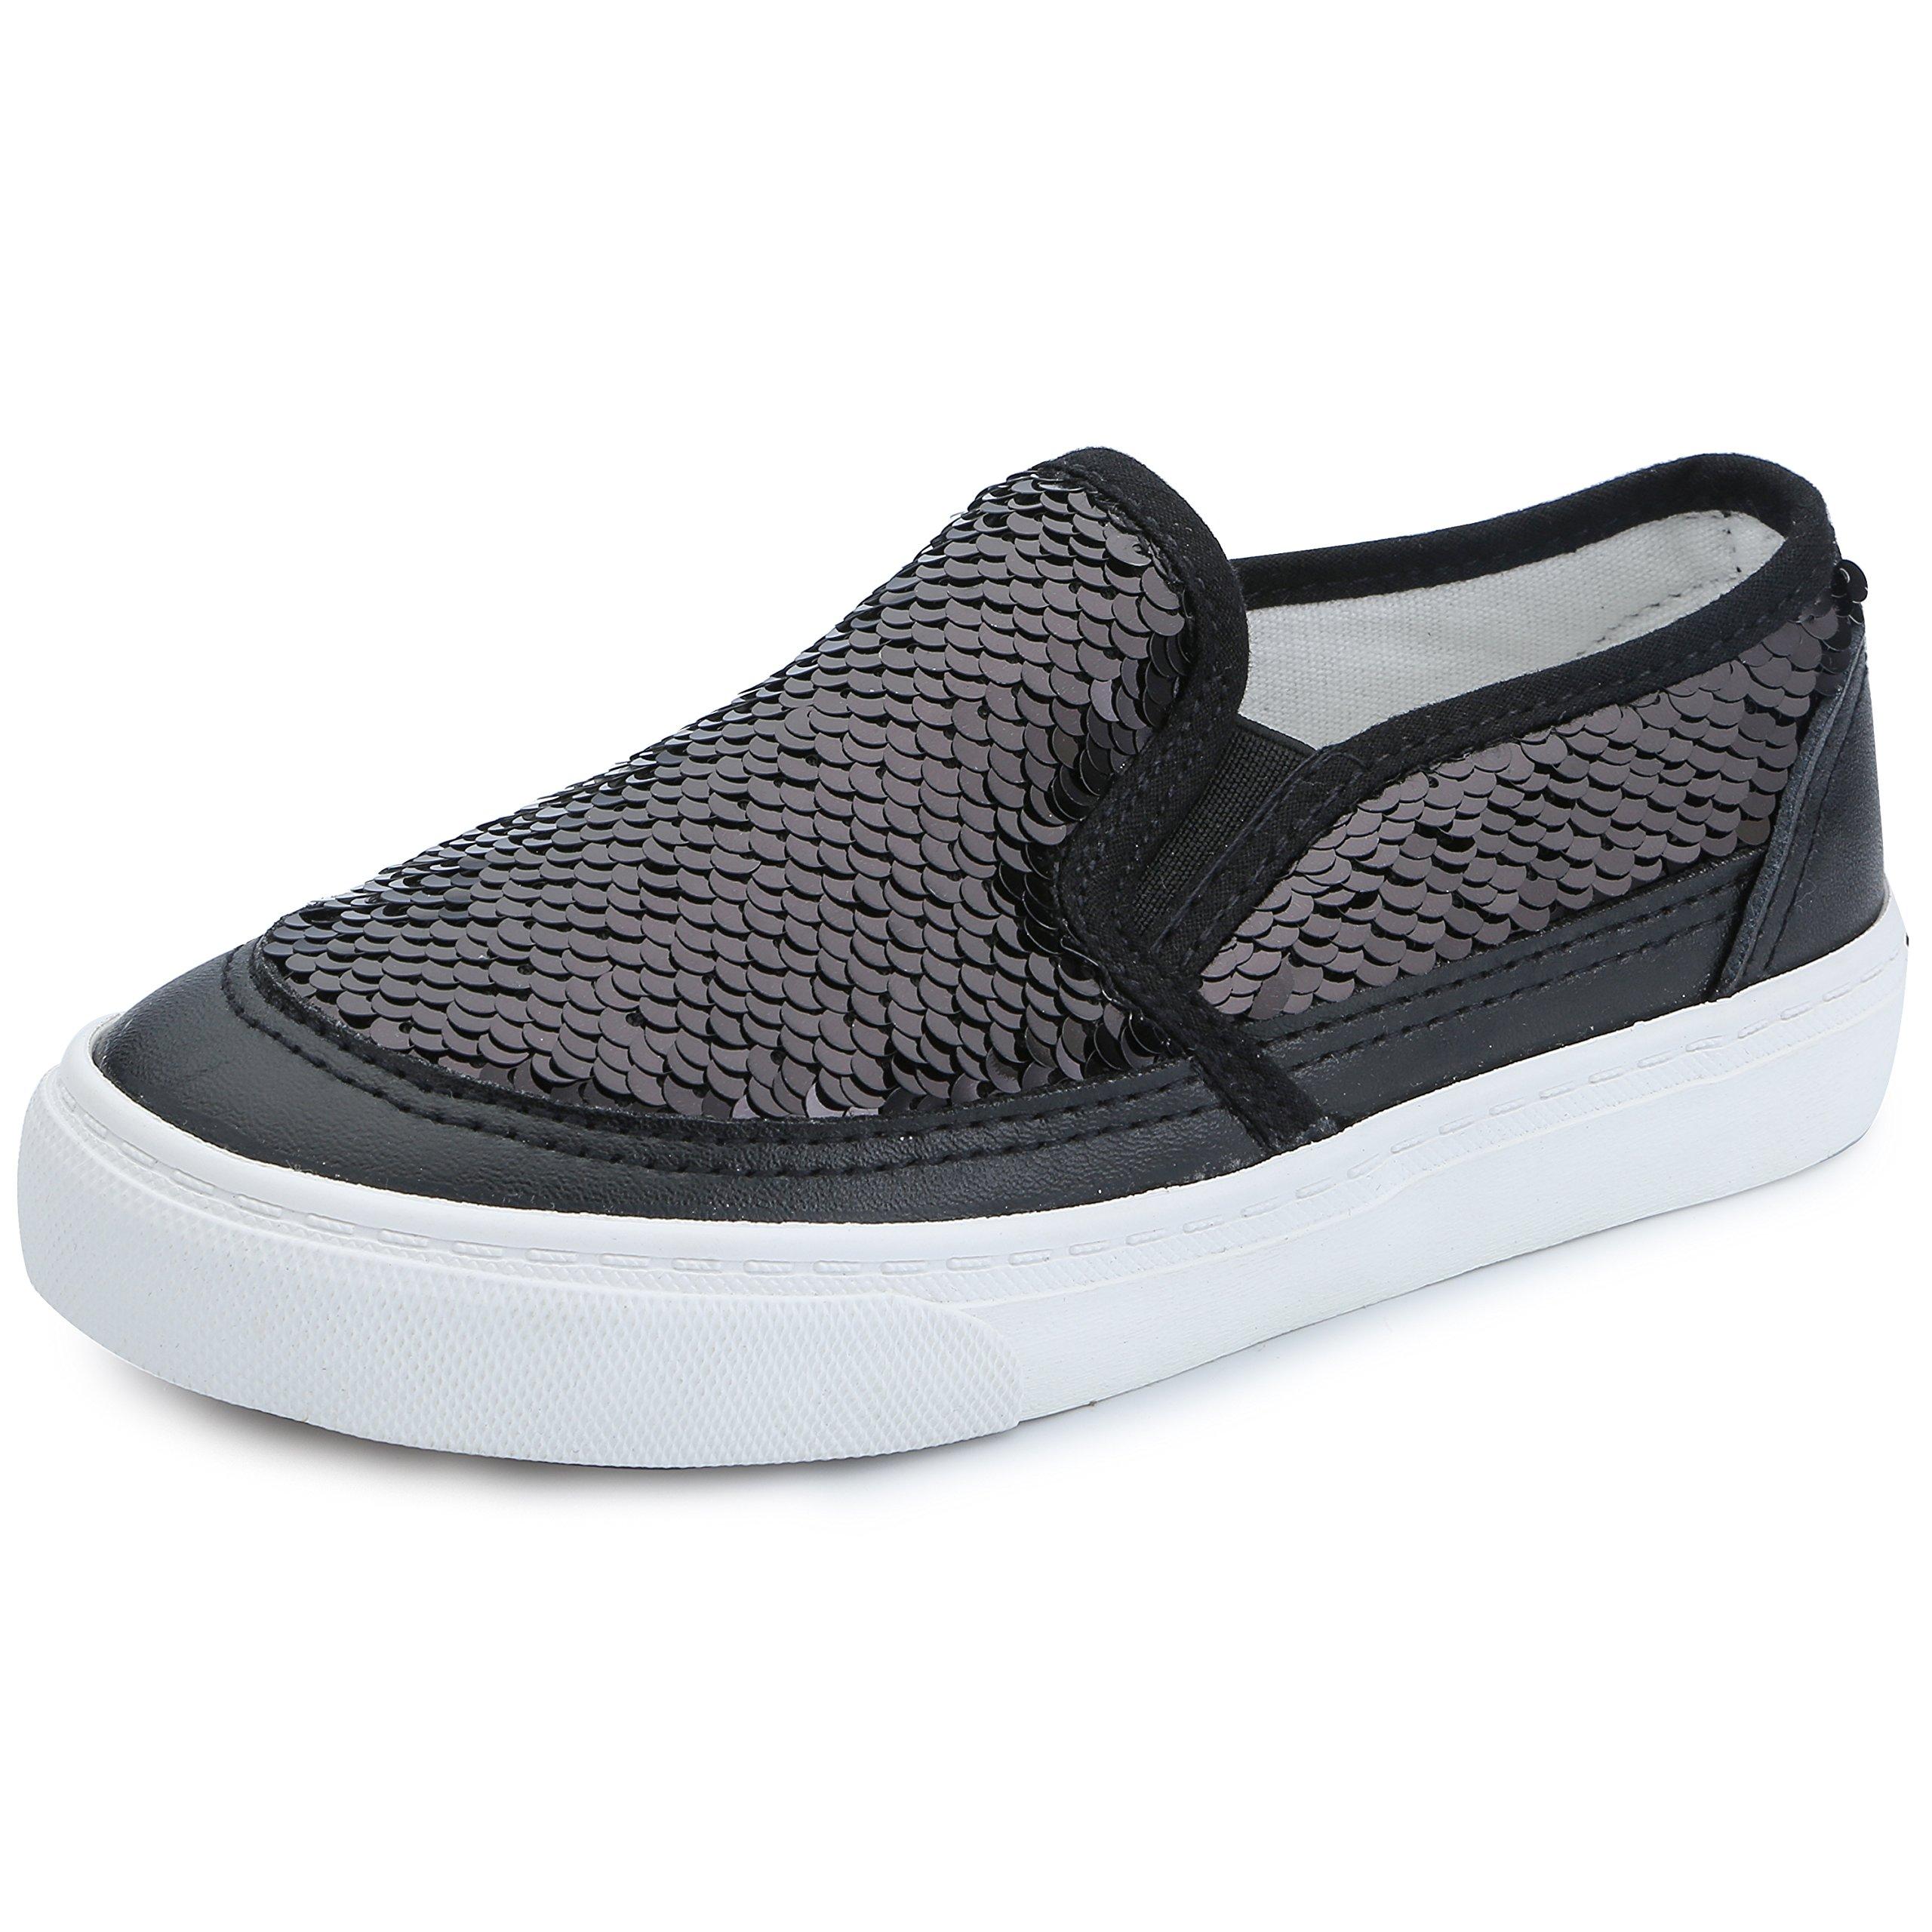 VECJUNIA Boy's Girl's Sequins Low Top Casual Loafers Sneakers(Toddler/Little Kid/Big Kid) (Black, 3 M US Little Kid )